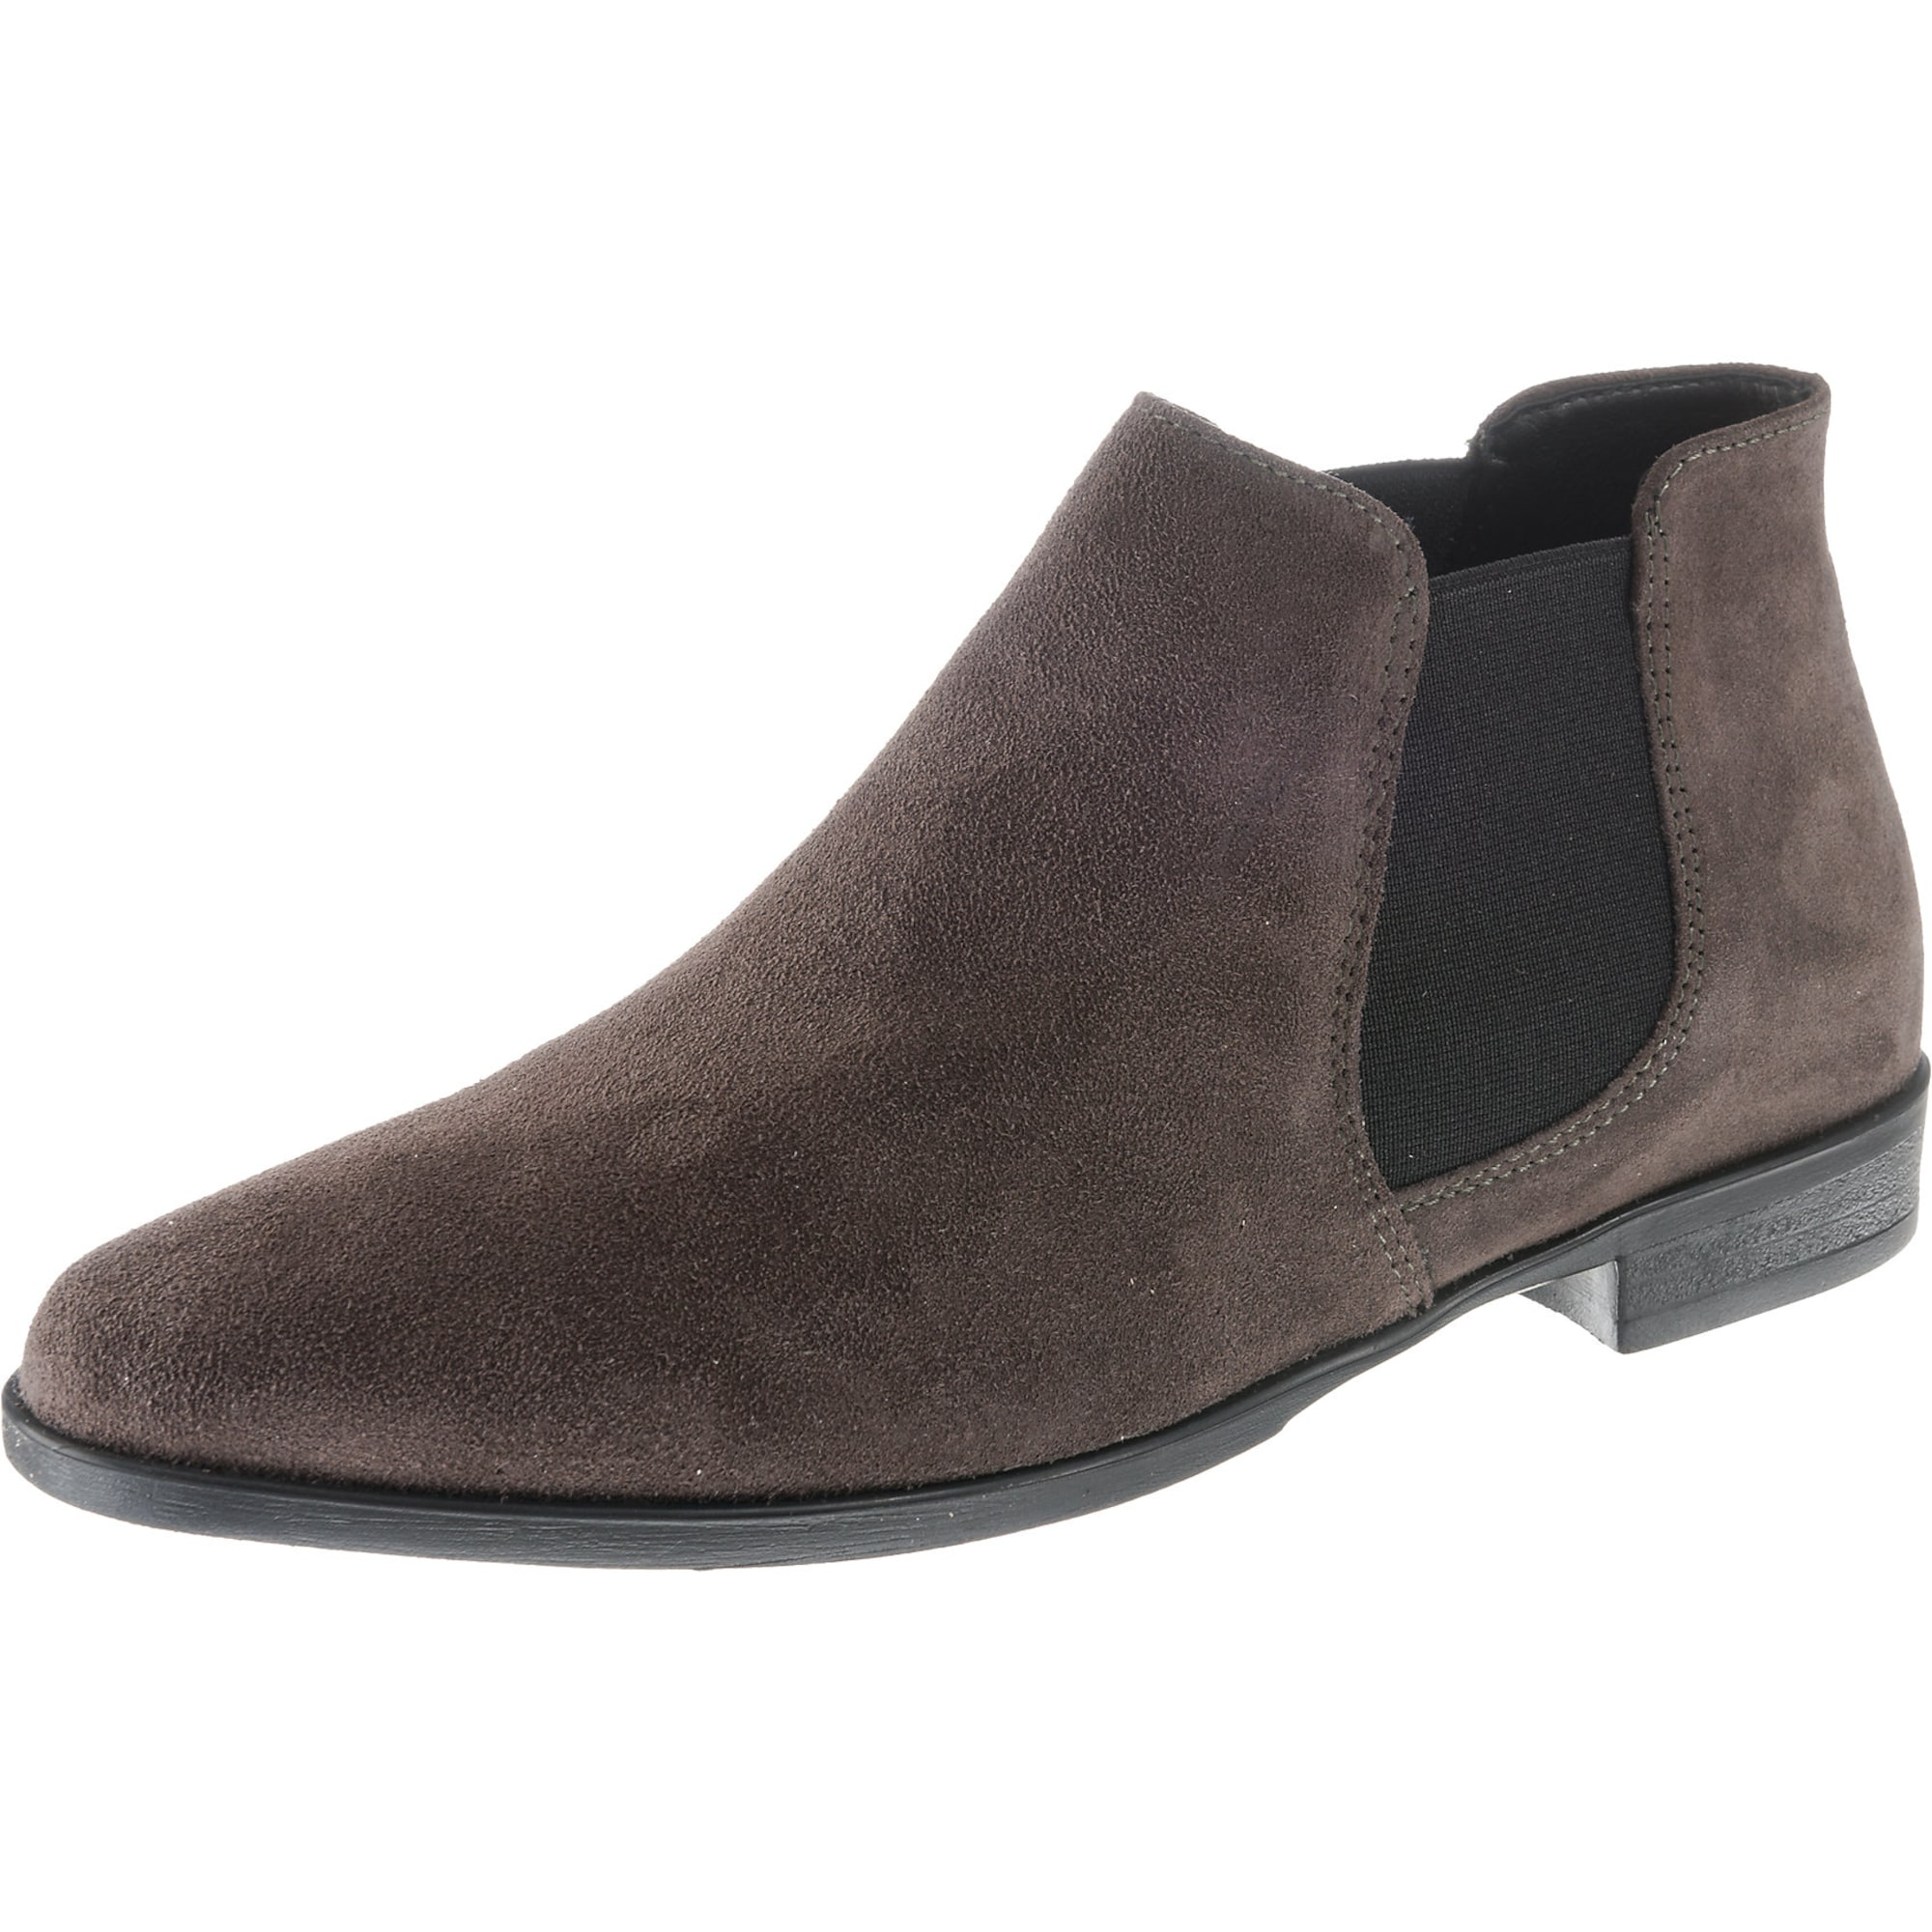 Chelsea boty antracitová TAMARIS